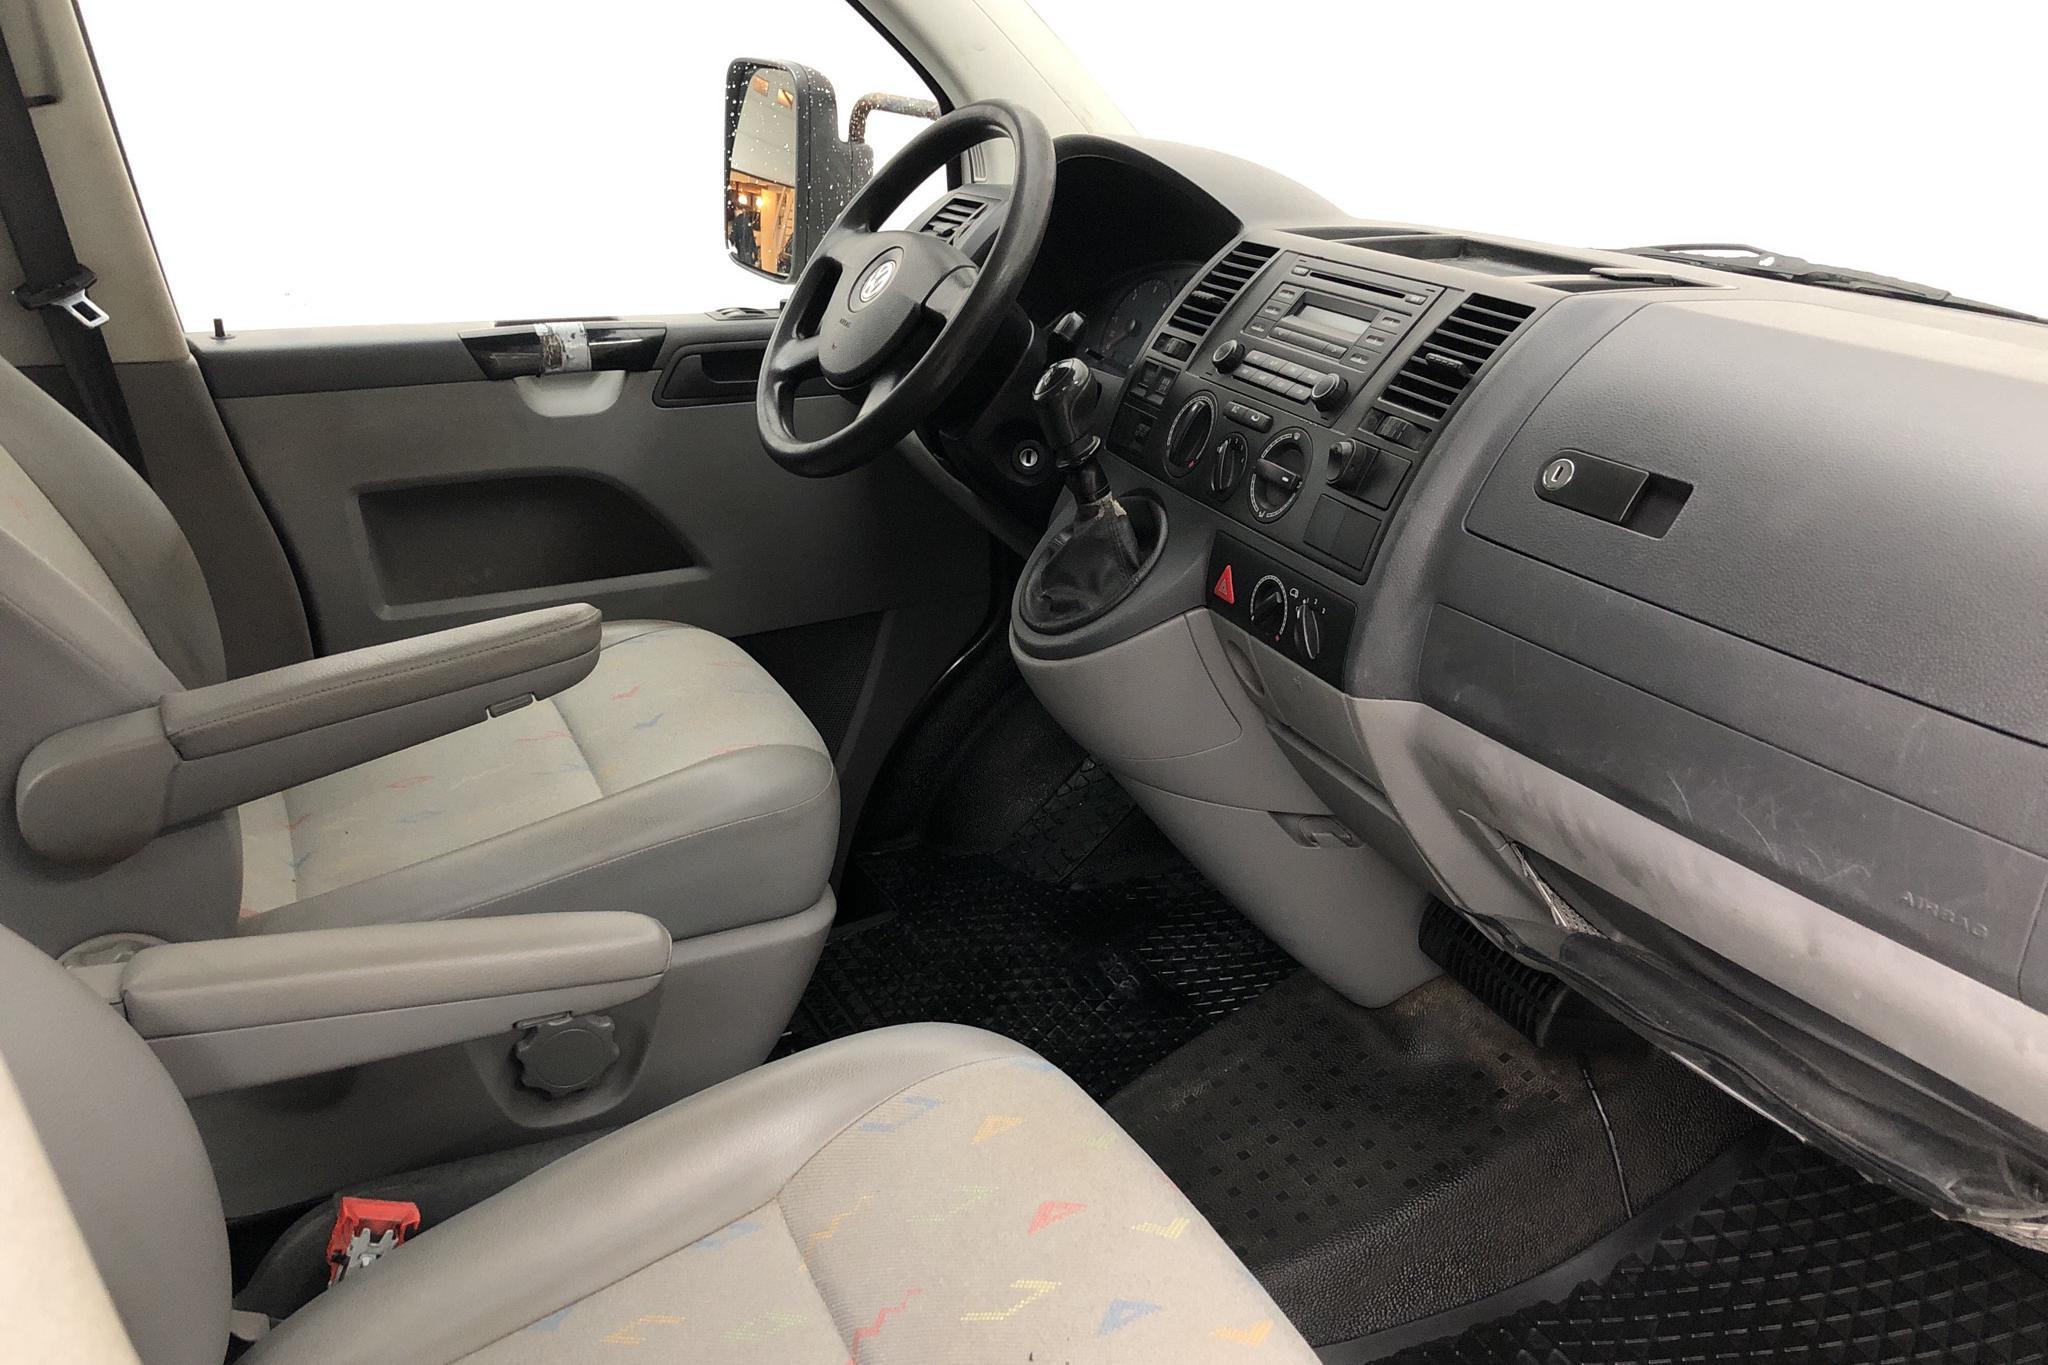 VW Transporter T5 2.5 TDI Pickup (174hk) - 198 280 km - Manual - white - 2008